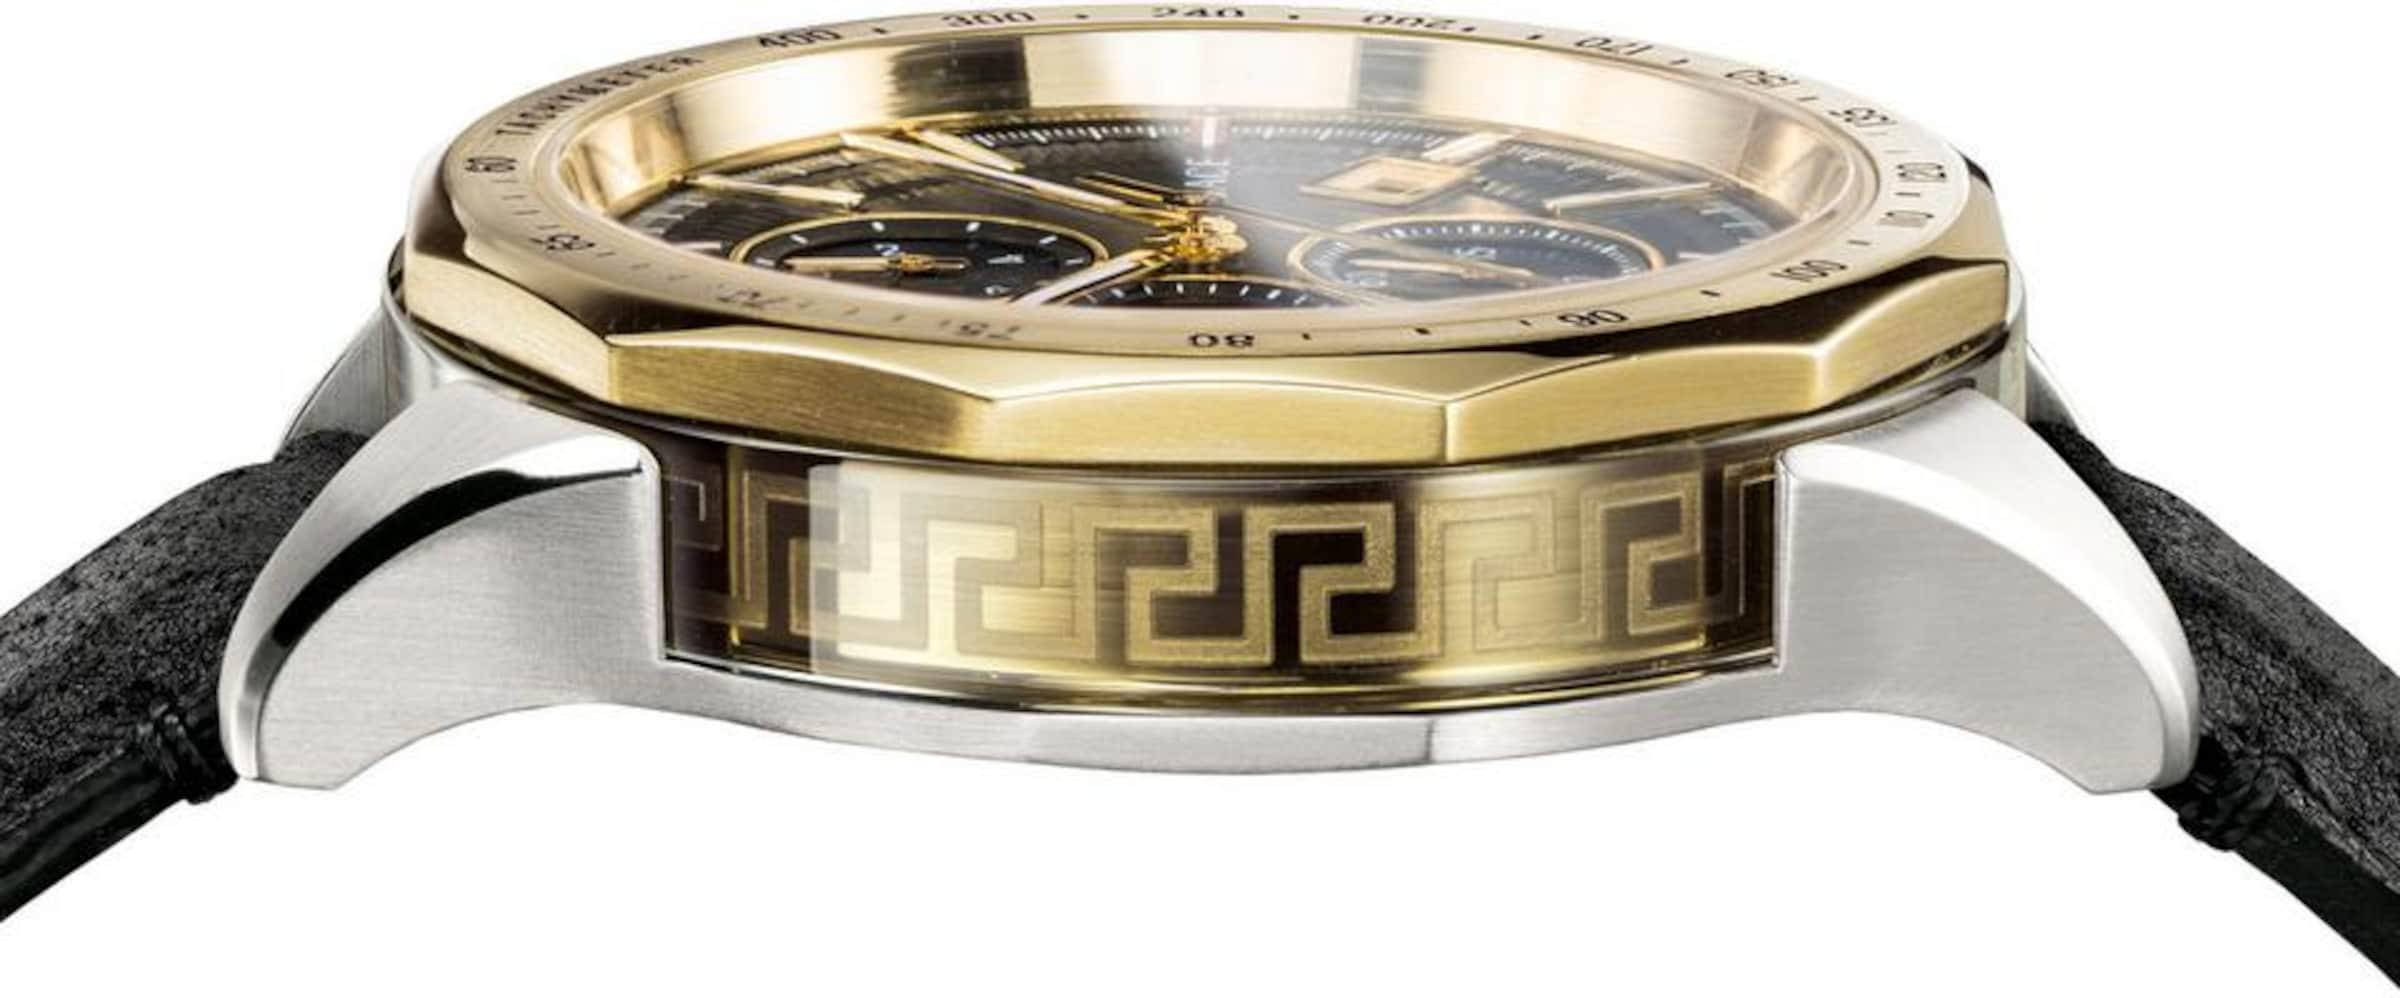 Versace In 'glaze' Silber Chronograph GoldSchwarz PNwX0nOk8